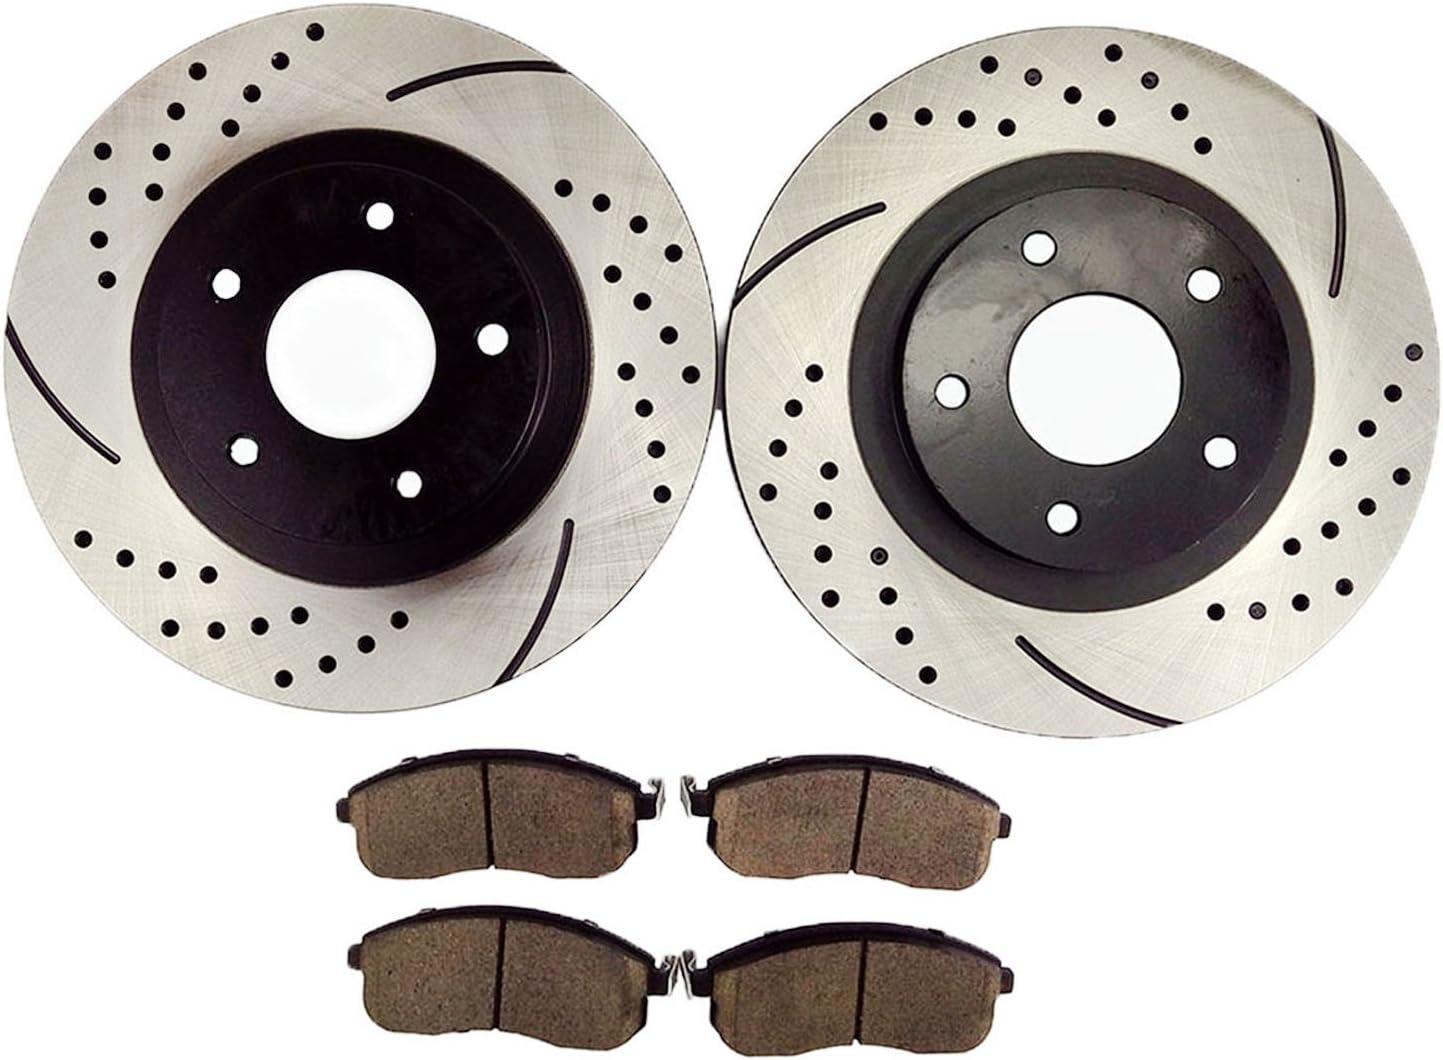 2002 2003 2004 Fits Infiniti I35 Rotors Ceramic Pads F OE Replacement